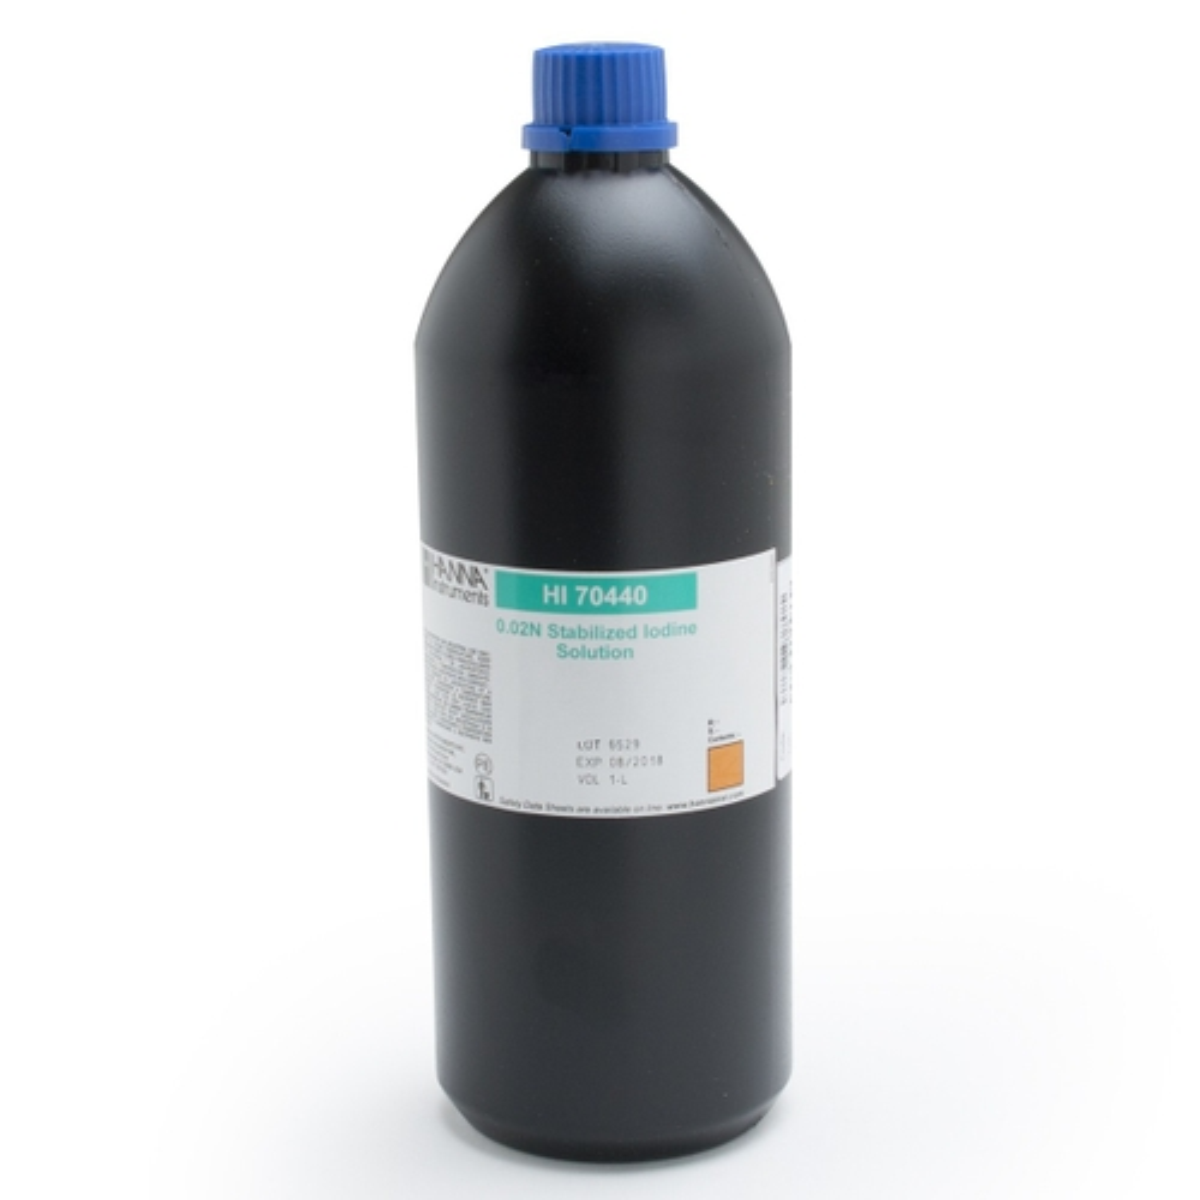 Stabilized Iodine 0.02N, 1L - HI70440